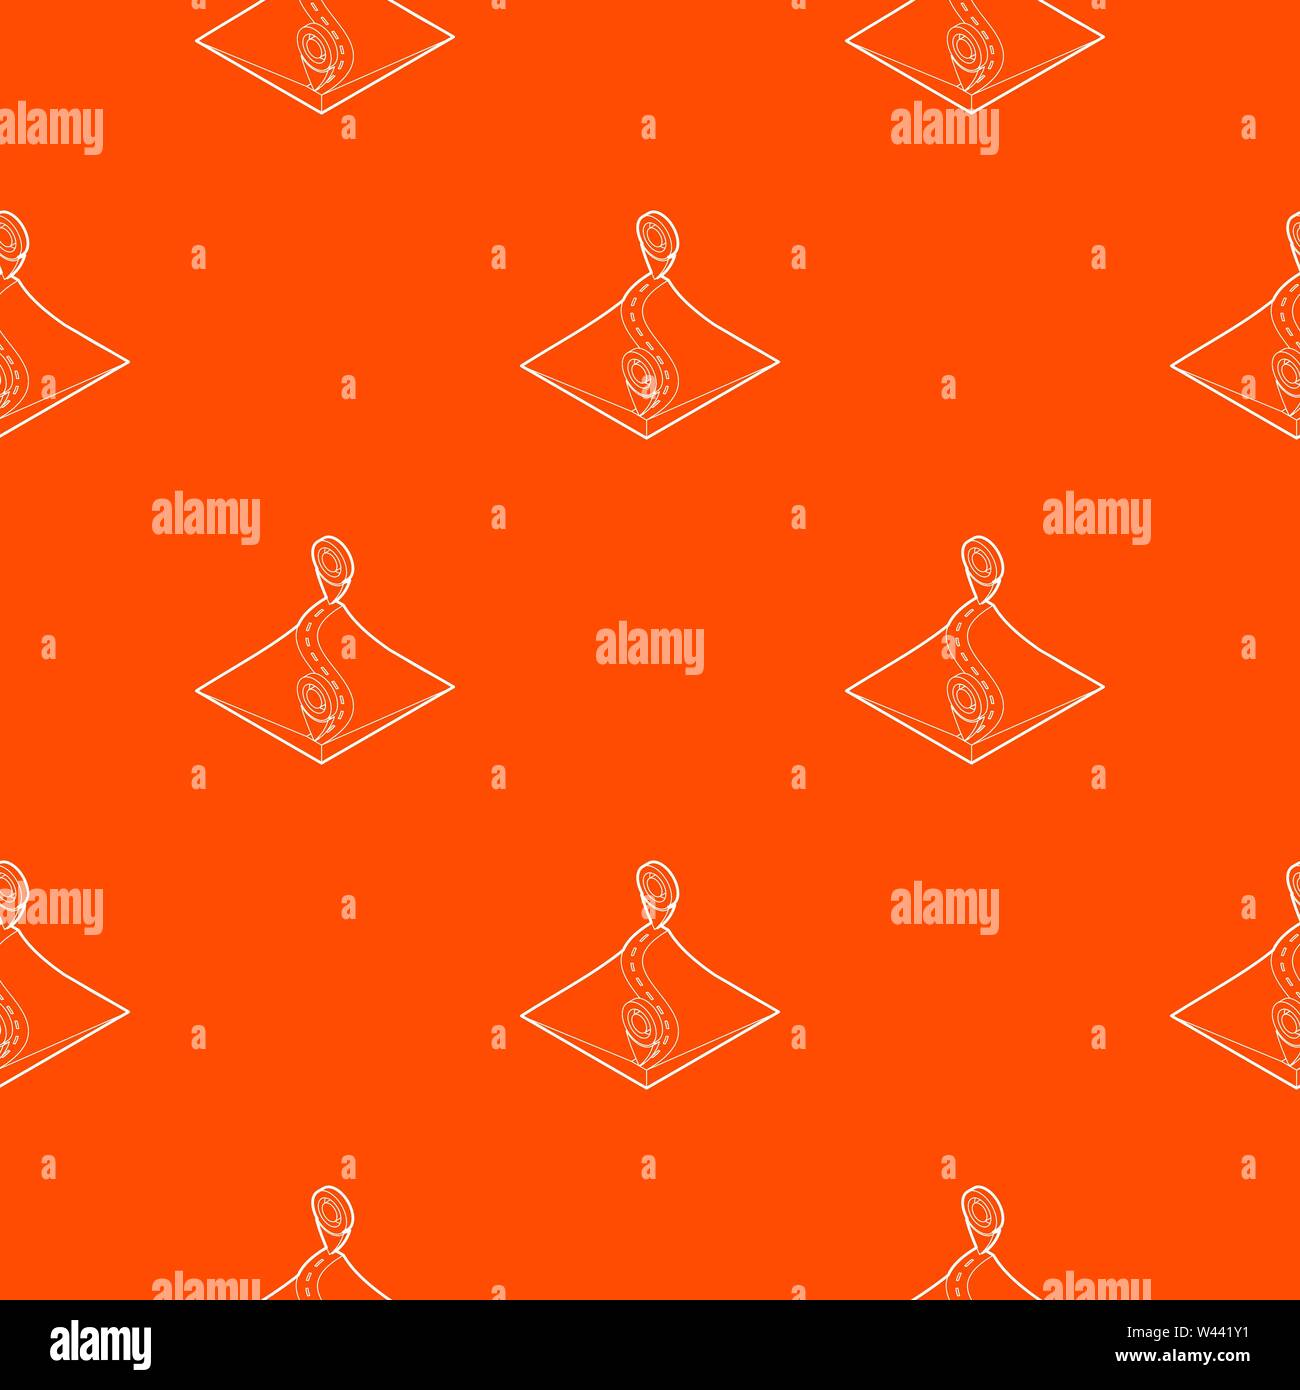 Route pattern vector orange - Stock Vector